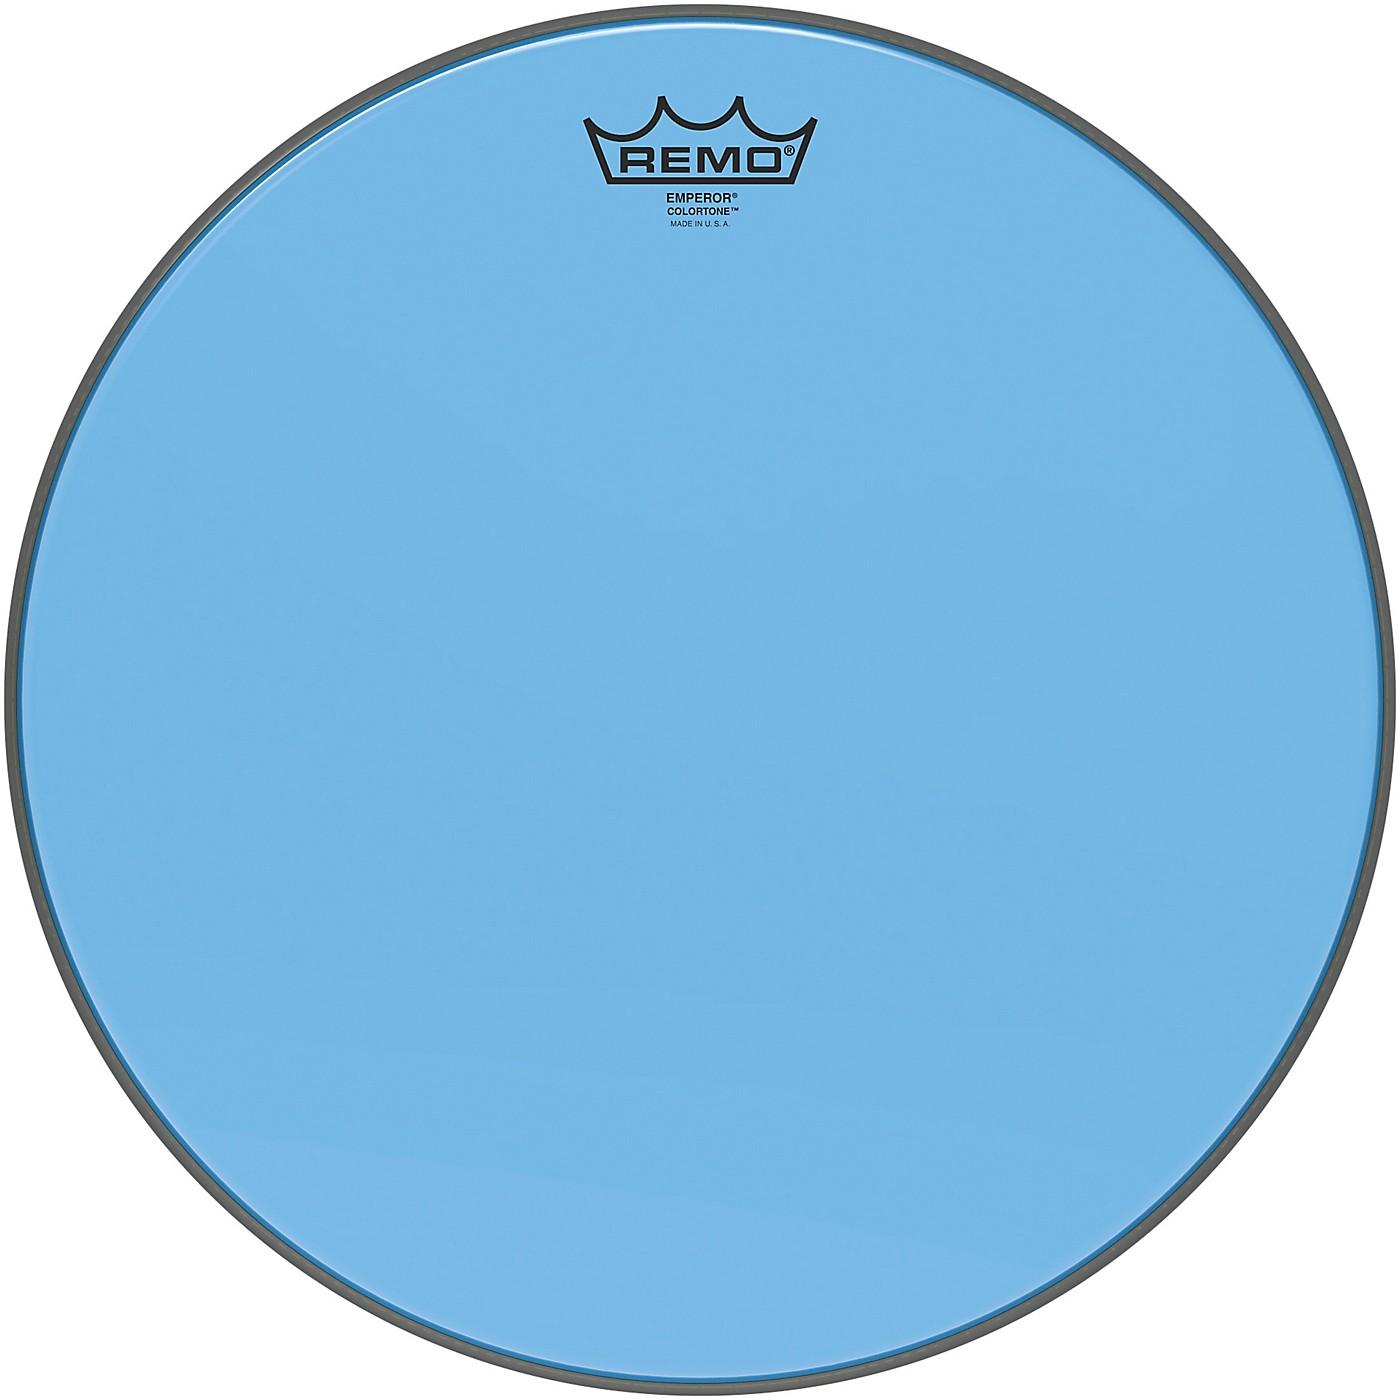 Remo Emperor Colortone Blue Drum Head thumbnail